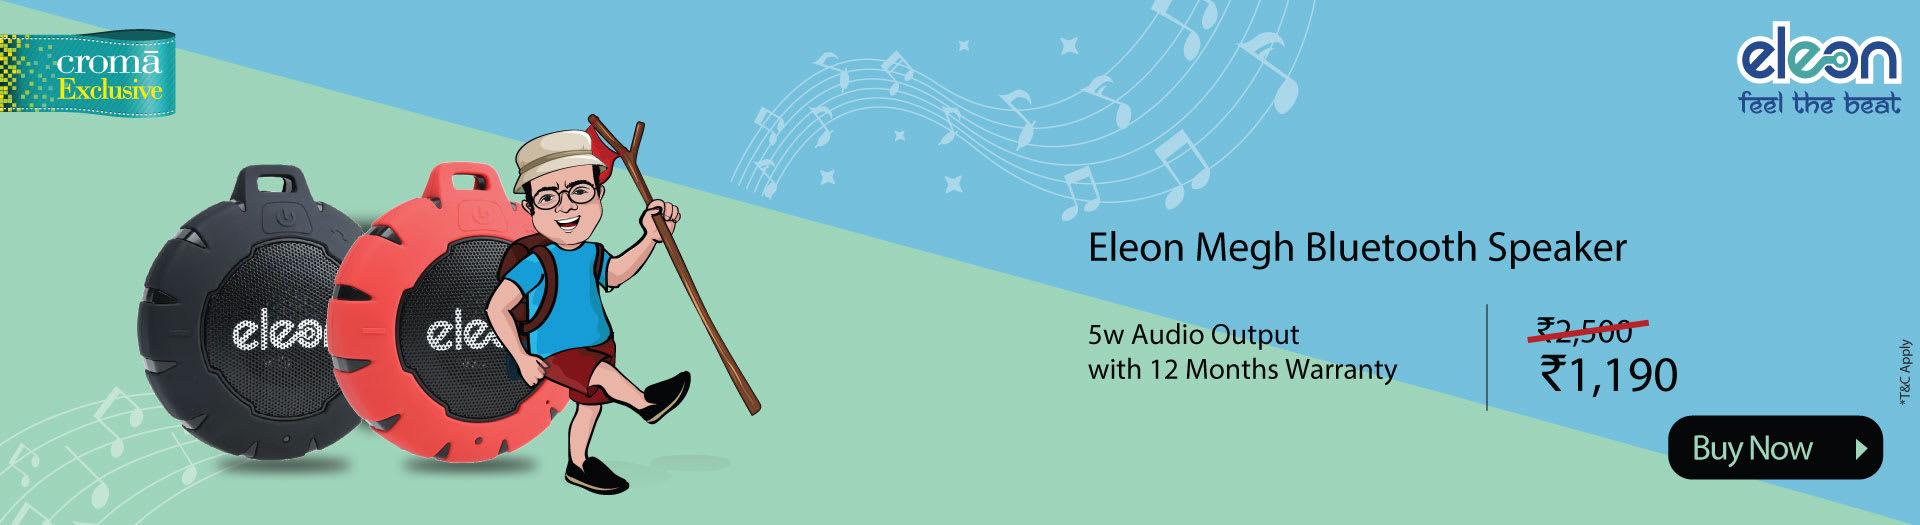 Eleon Megh